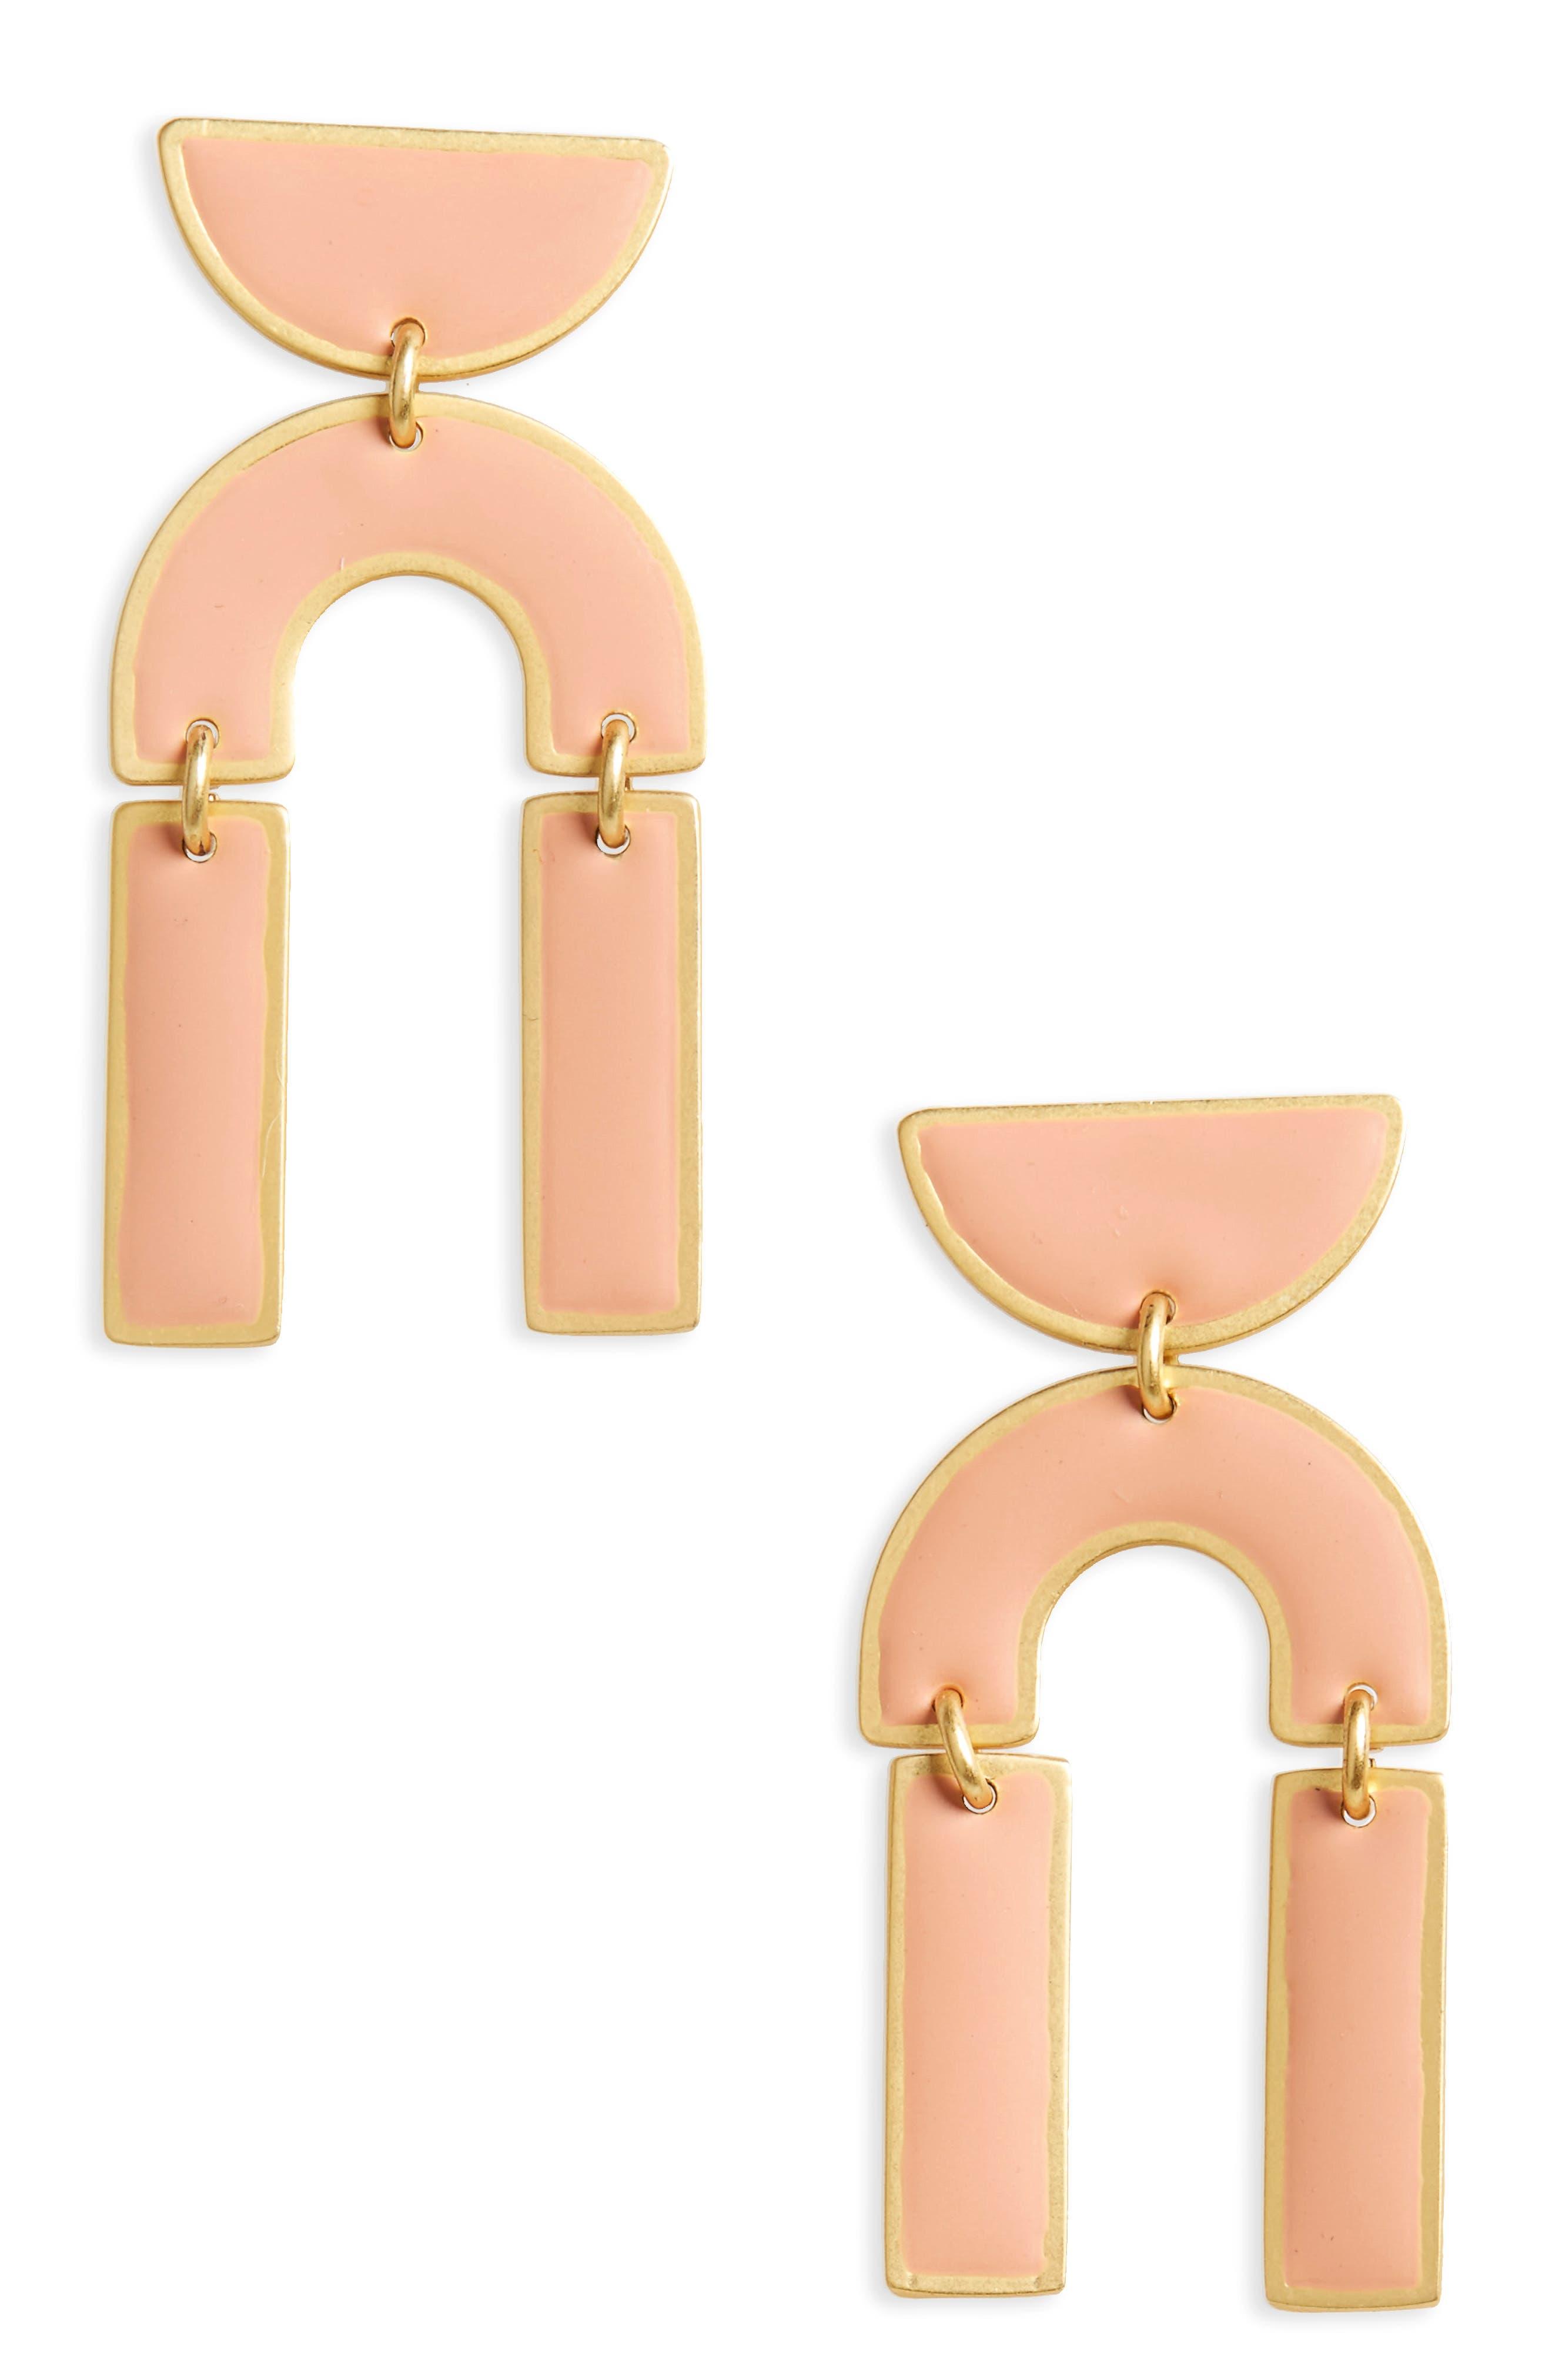 Modernism Half-Drop Earrings,                             Main thumbnail 1, color,